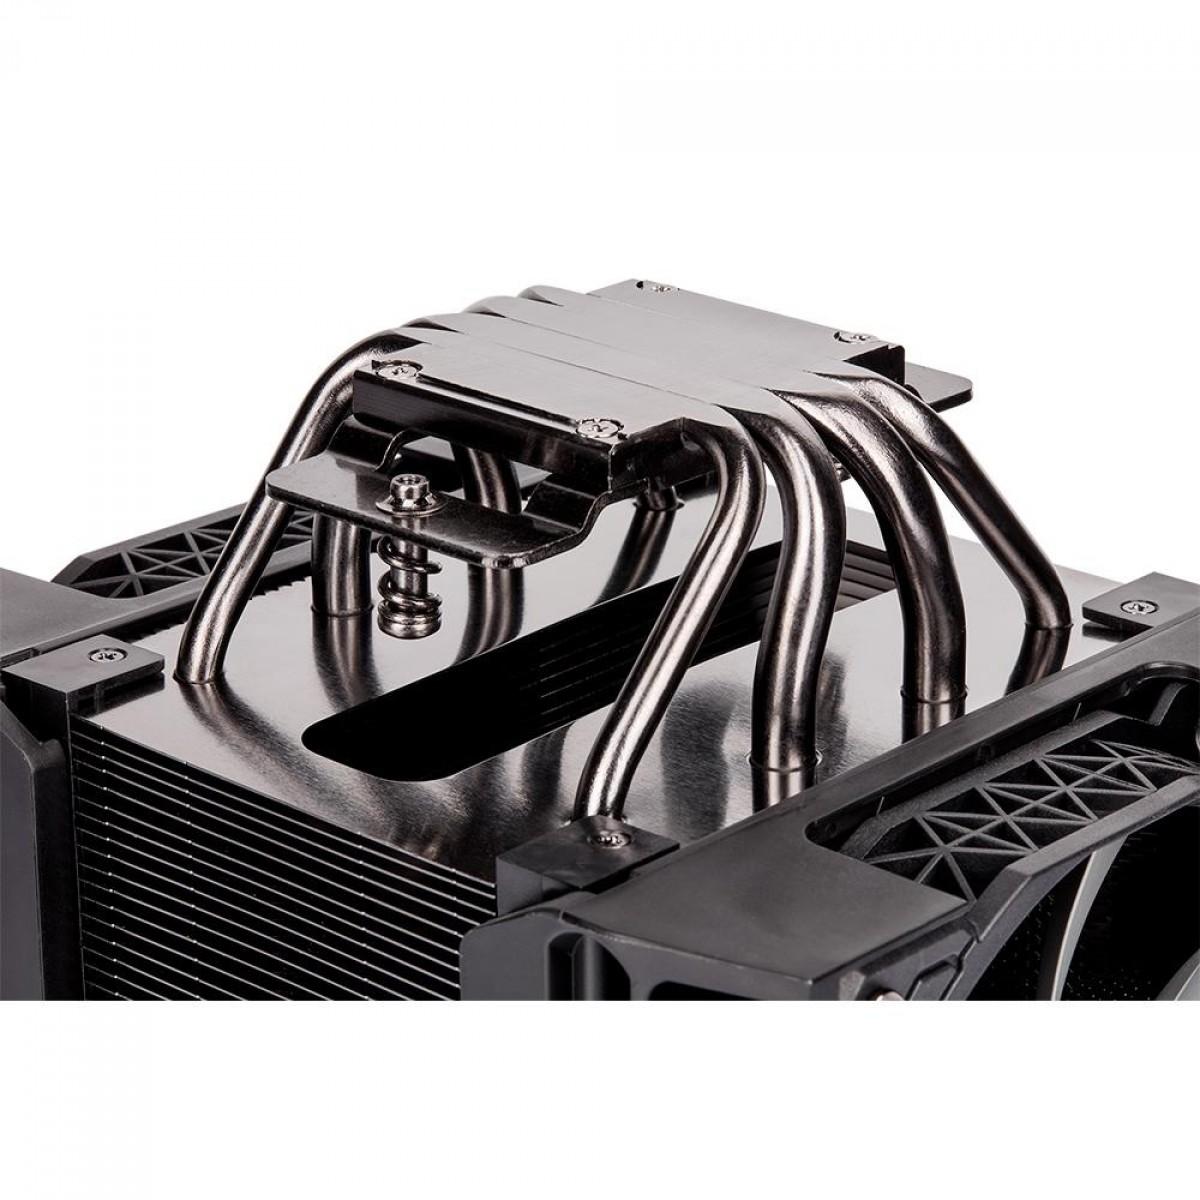 Cooler para Processador Corsair A500, Fan Duplo, Intel-AMD, CT-9010003-WW